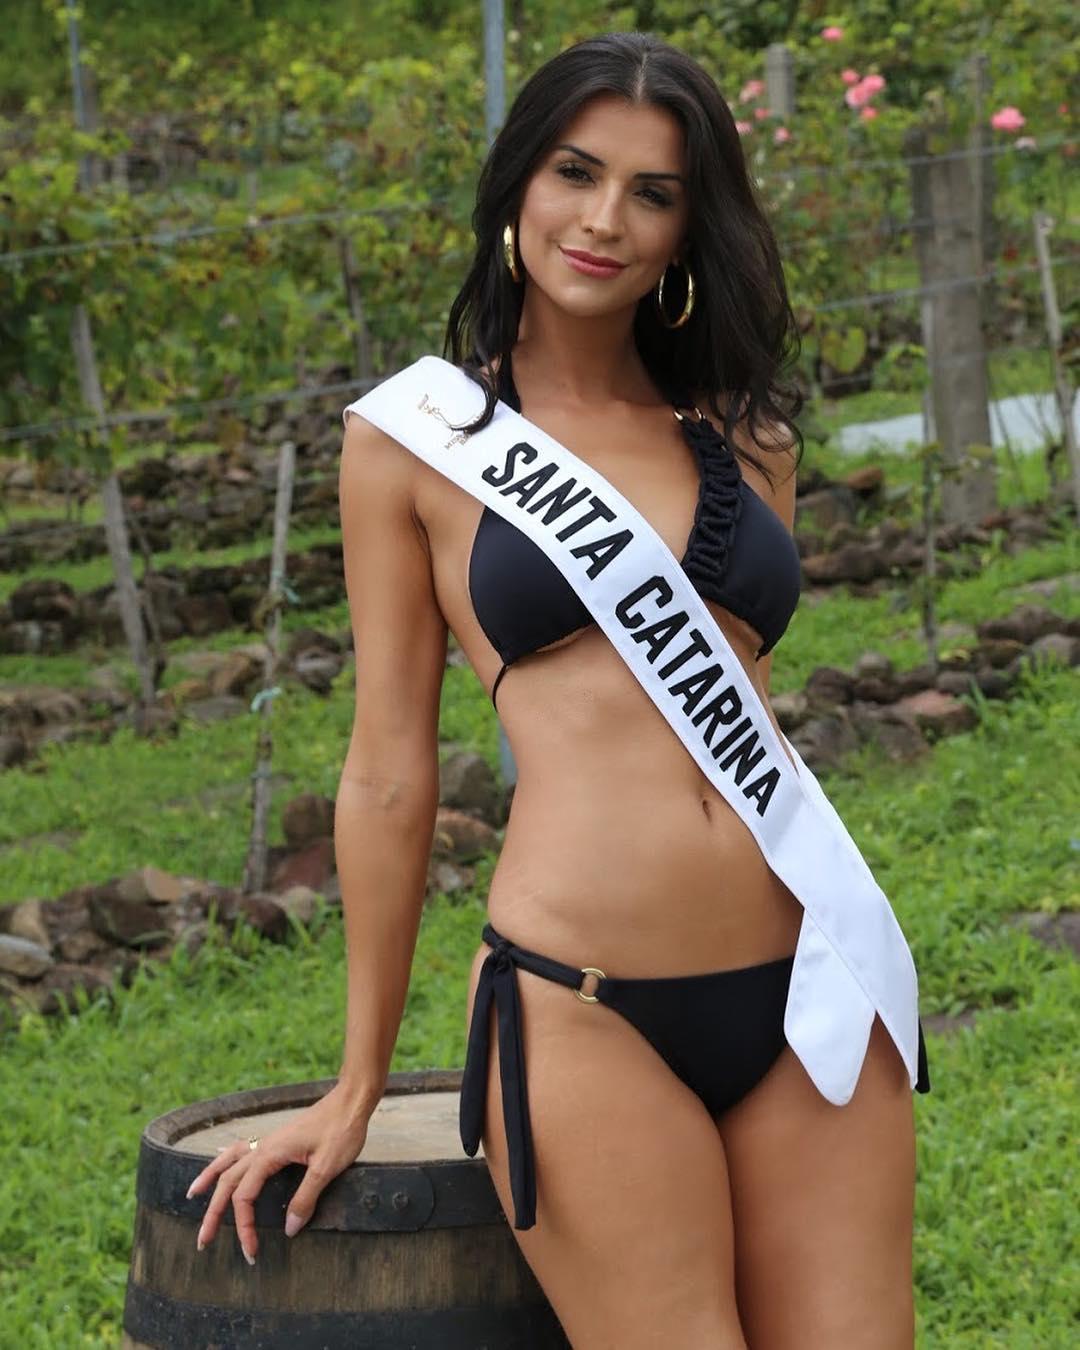 sao paulo vence miss grand brasil 2019. - Página 2 Nnp5obe6